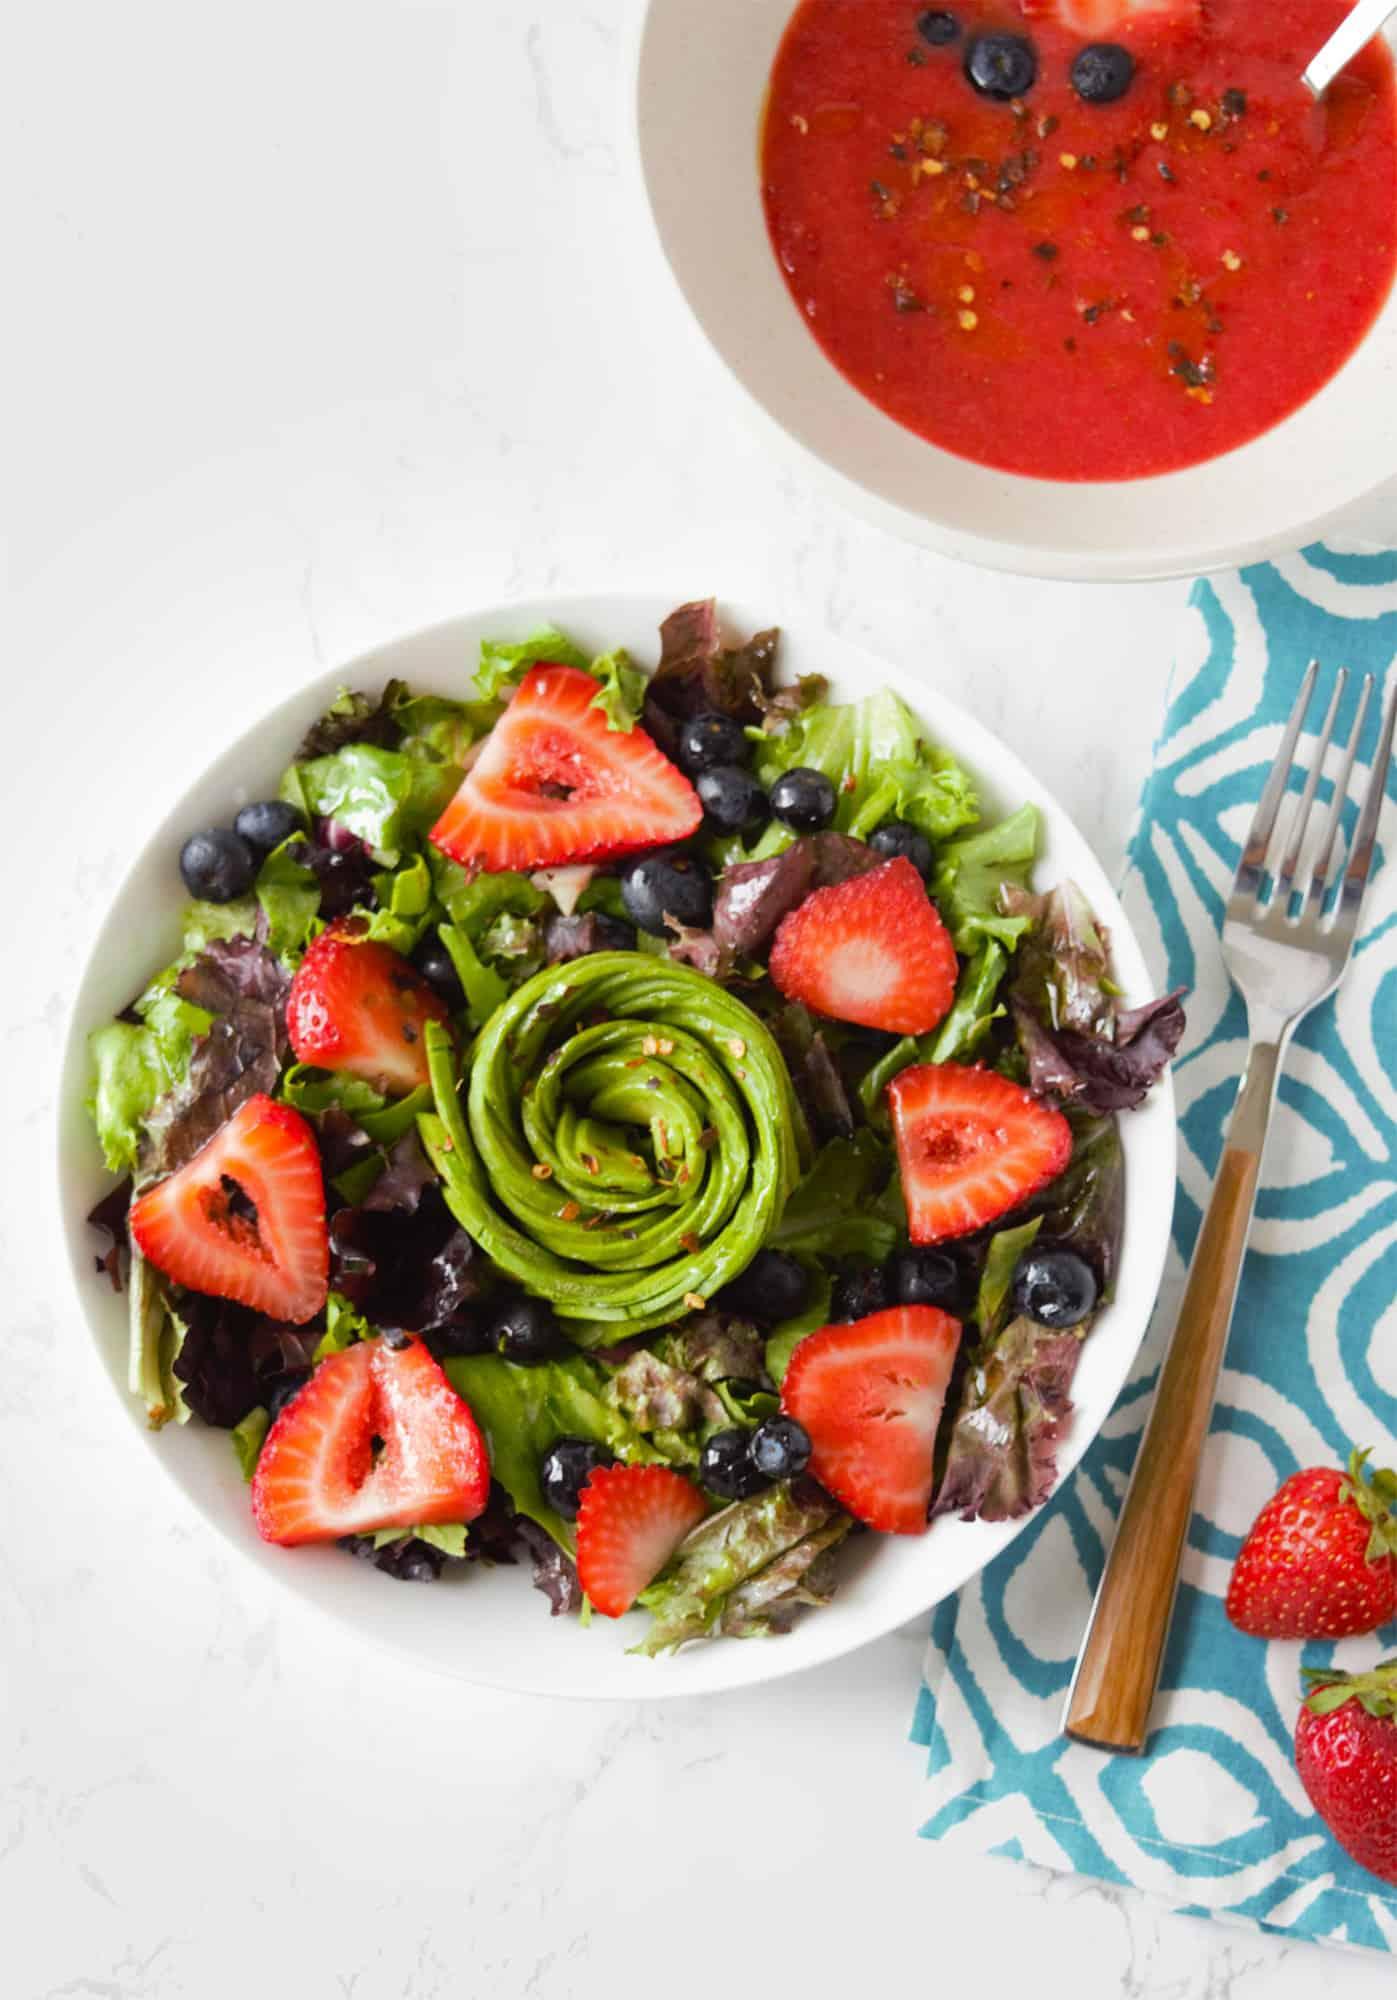 Vegan summer berry salad with strawberry balsamic vinaigrette